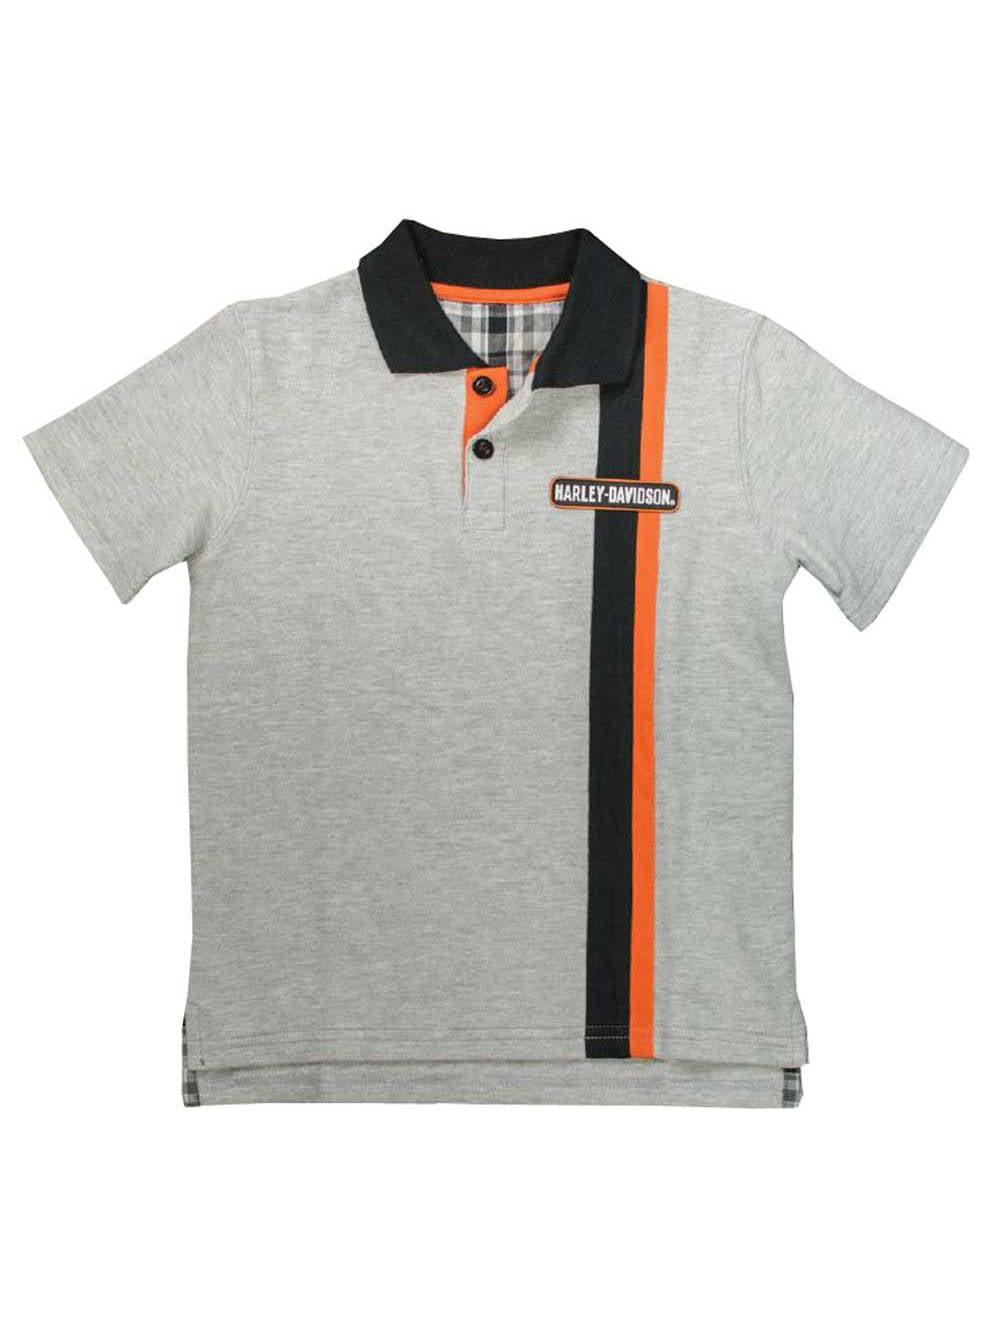 Harley-Davidson Little Boys' Bar & Shield Short Sleeve Pique Polo, Gray 1081637, Harley Davidson